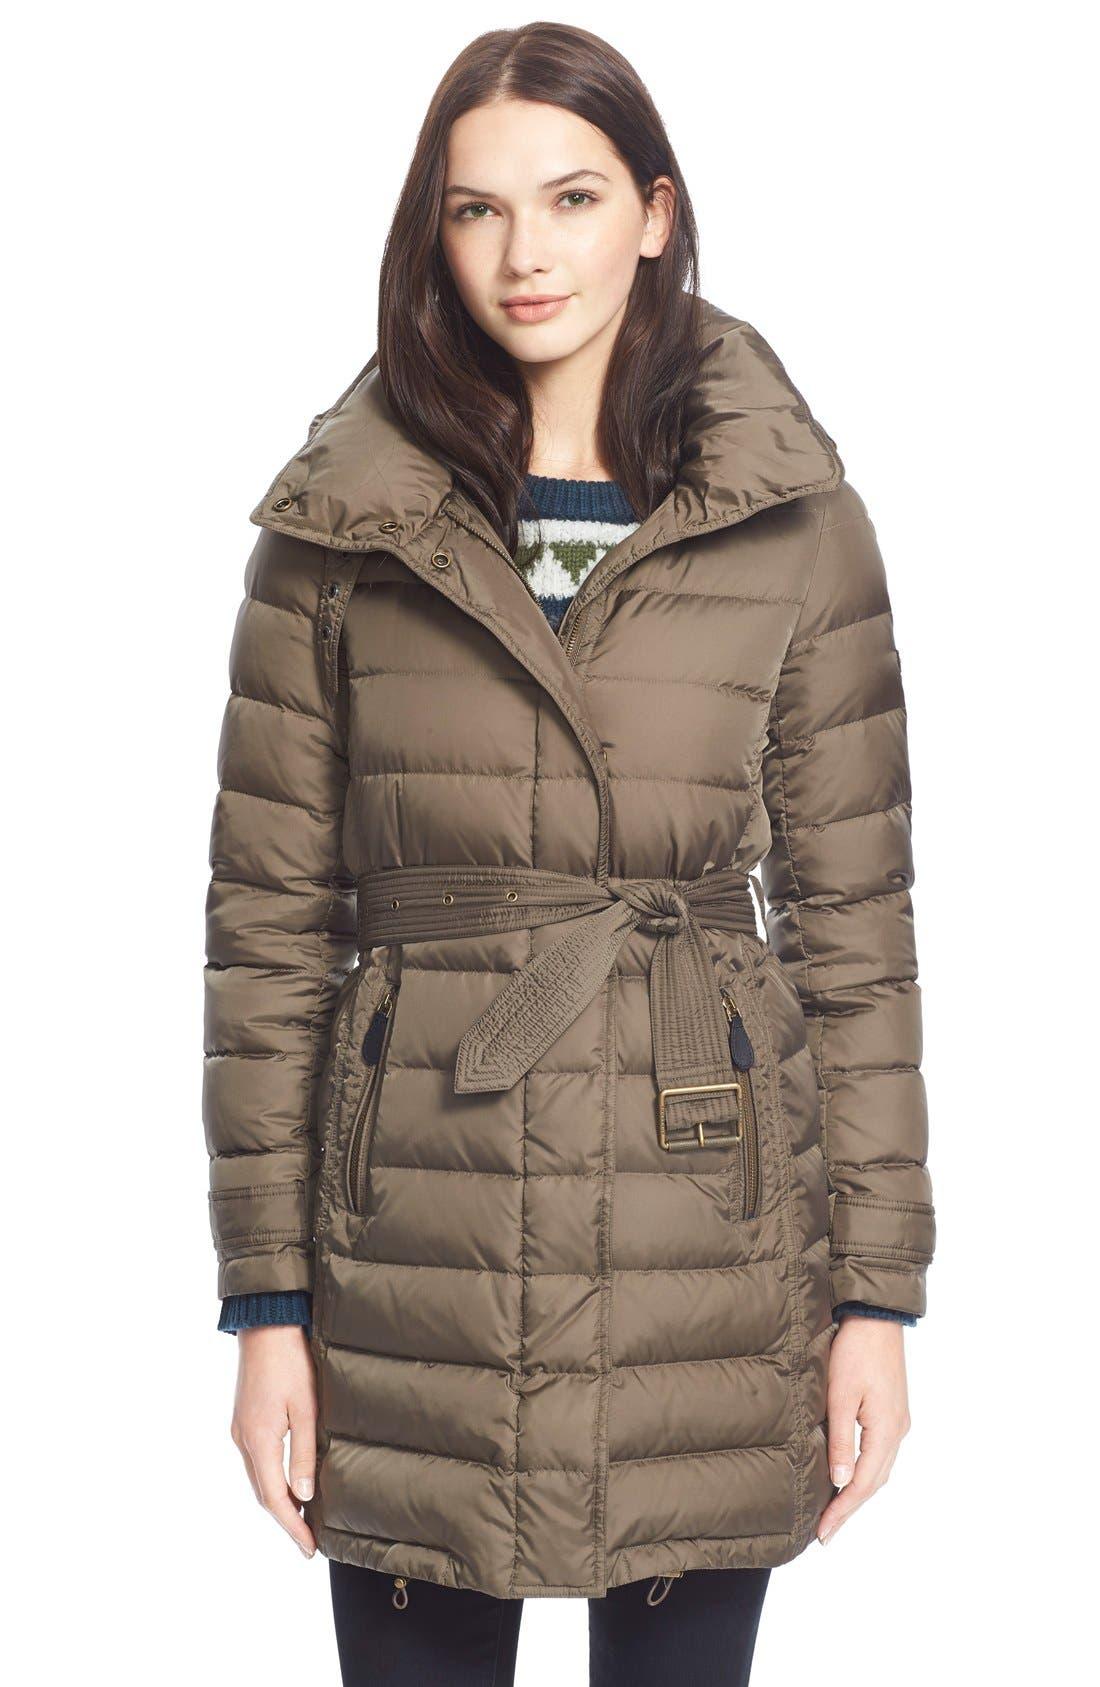 Alternate Image 1 Selected - BurberryBrit'Winterleigh' Belted Down Coat